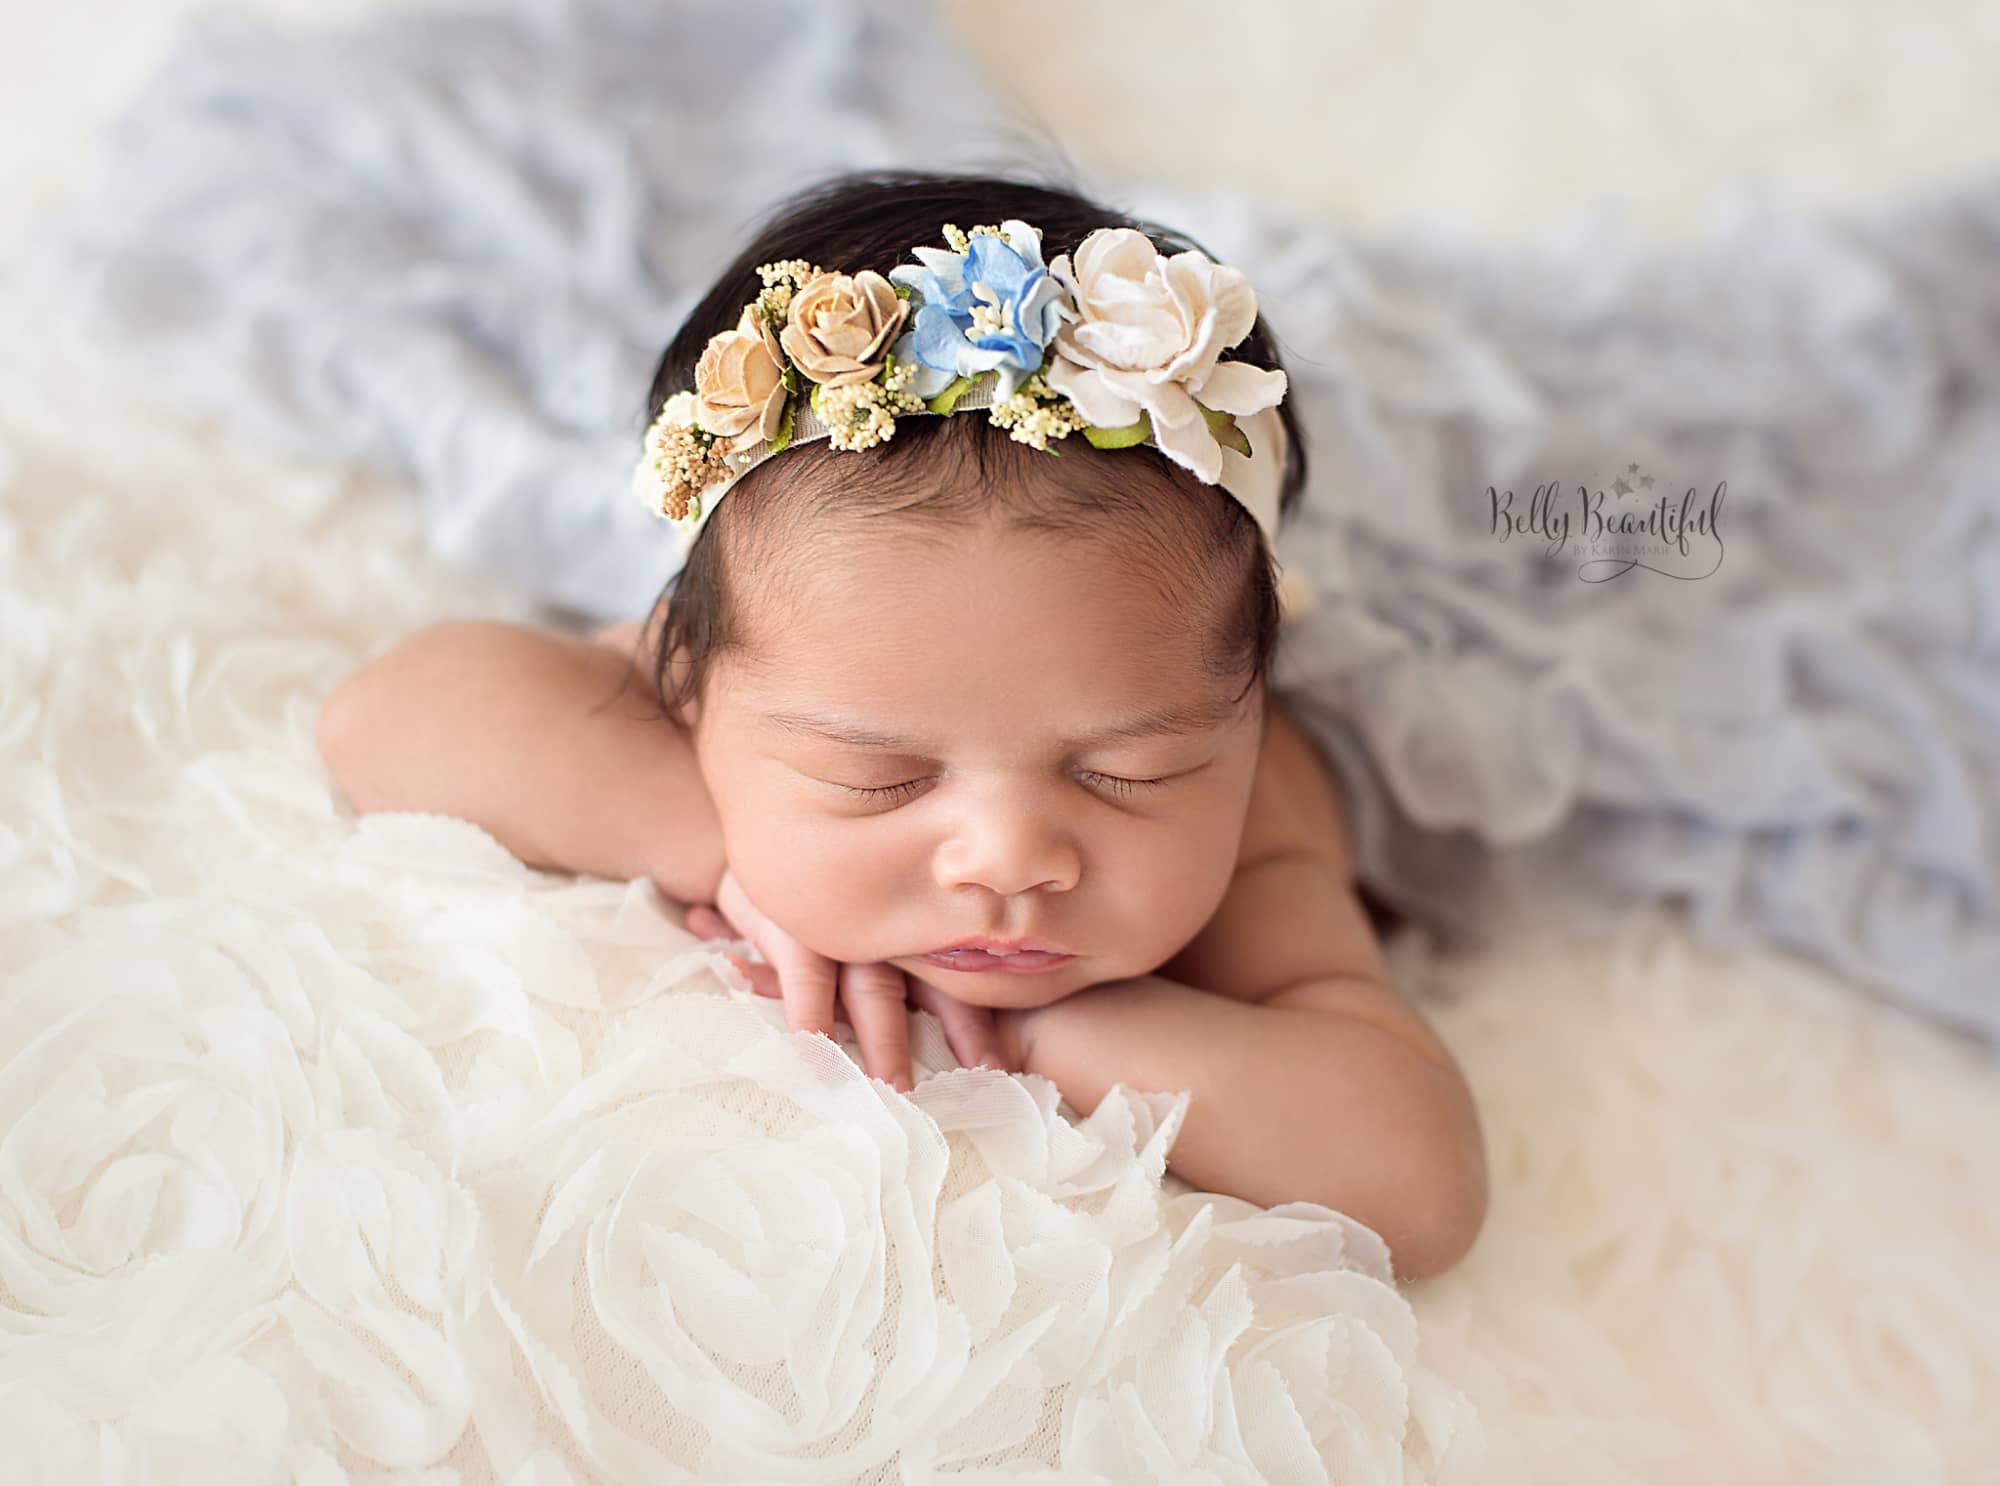 newbornphotography min image